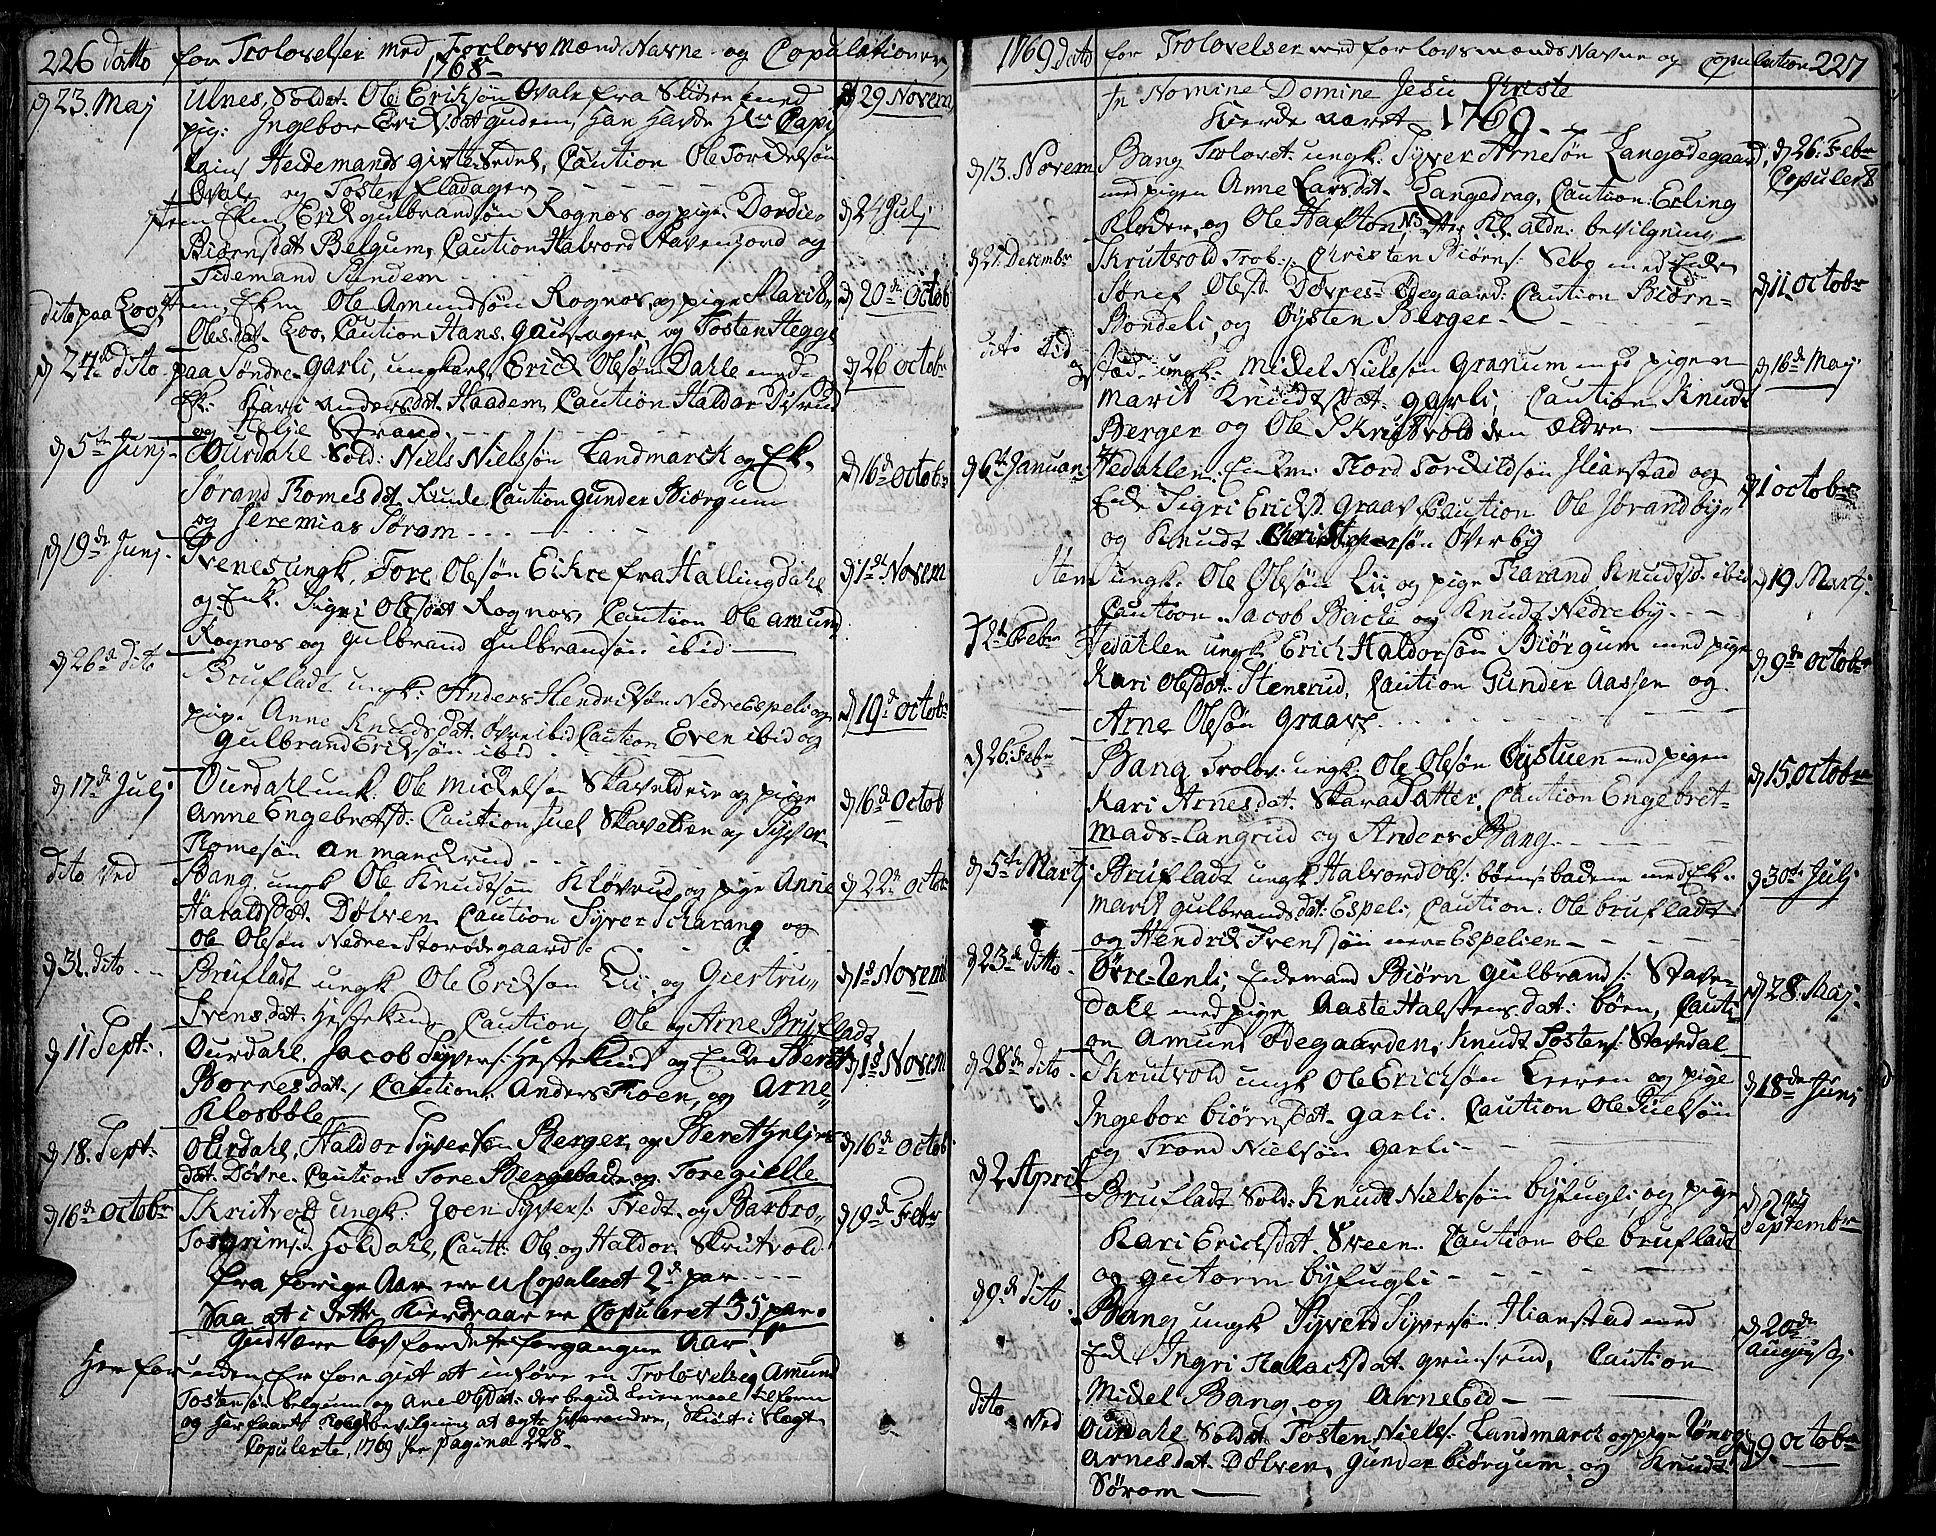 SAH, Aurdal prestekontor, Ministerialbok nr. 5, 1763-1781, s. 226-227